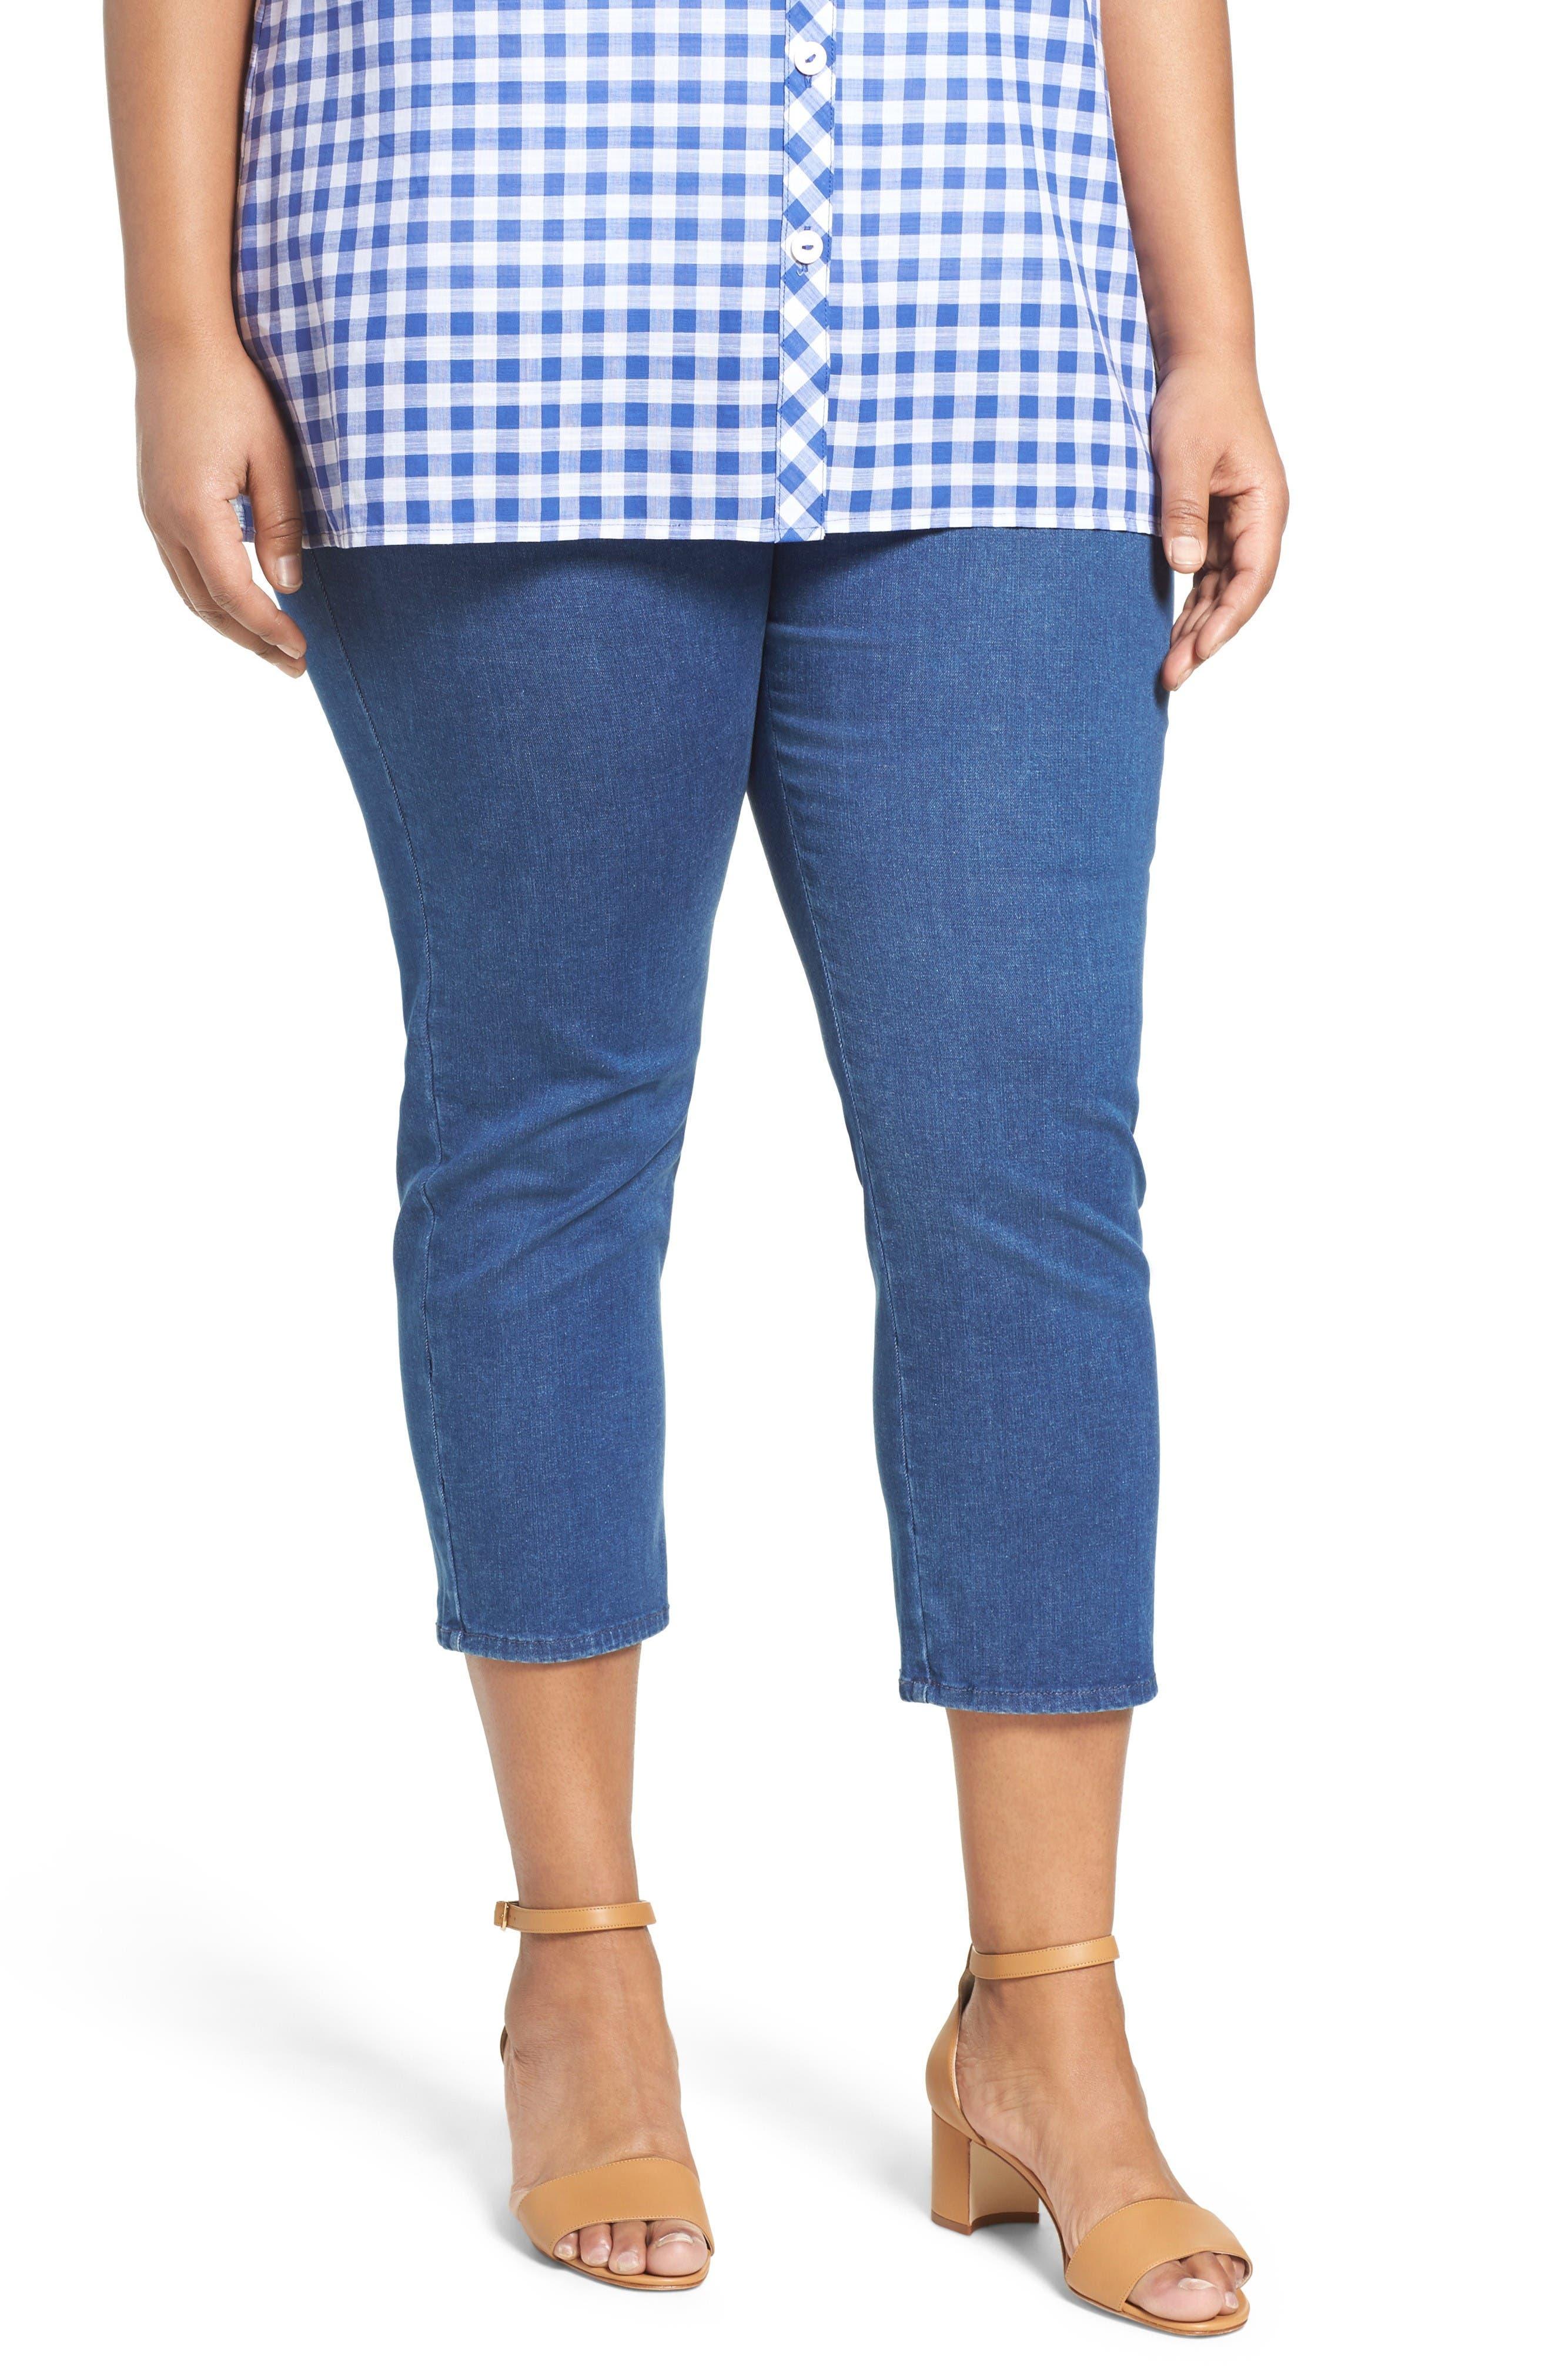 Alternate Image 1 Selected - Foxcroft Nina Slimming Pull-On Capri Jeans (Plus Size)